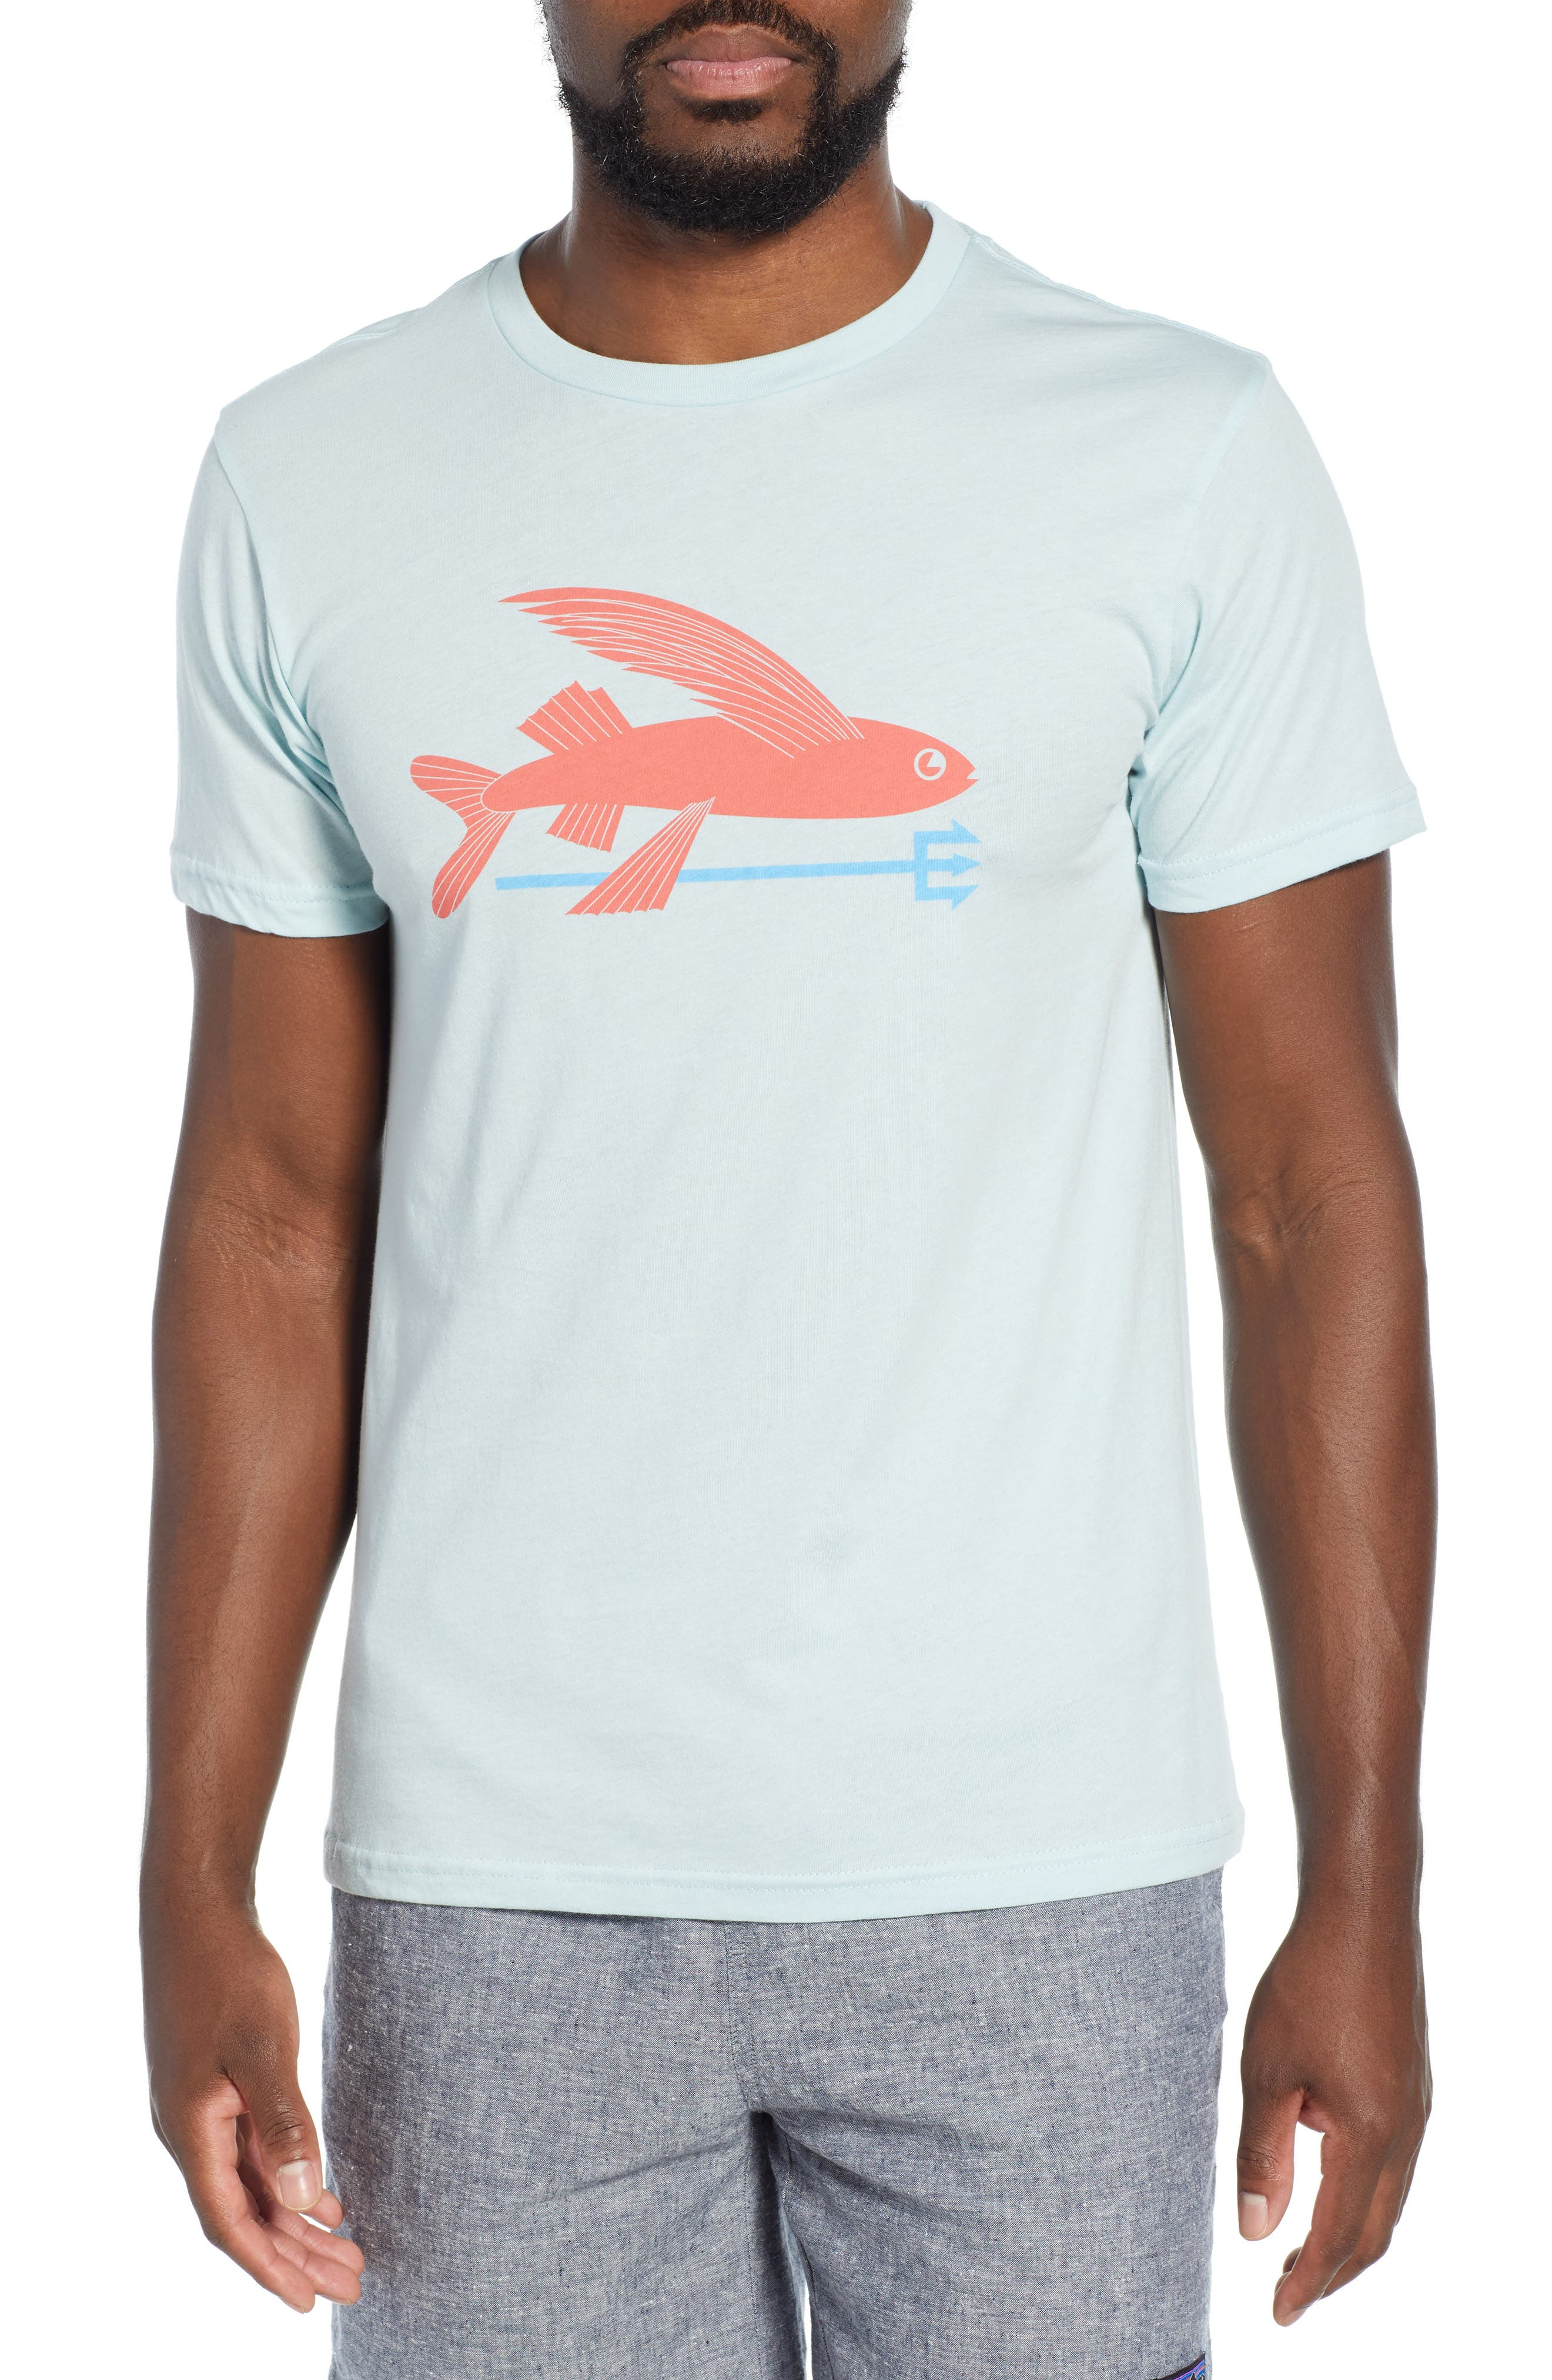 Patagonia Flying Fish Organic Cotton T-Shirt, Blue